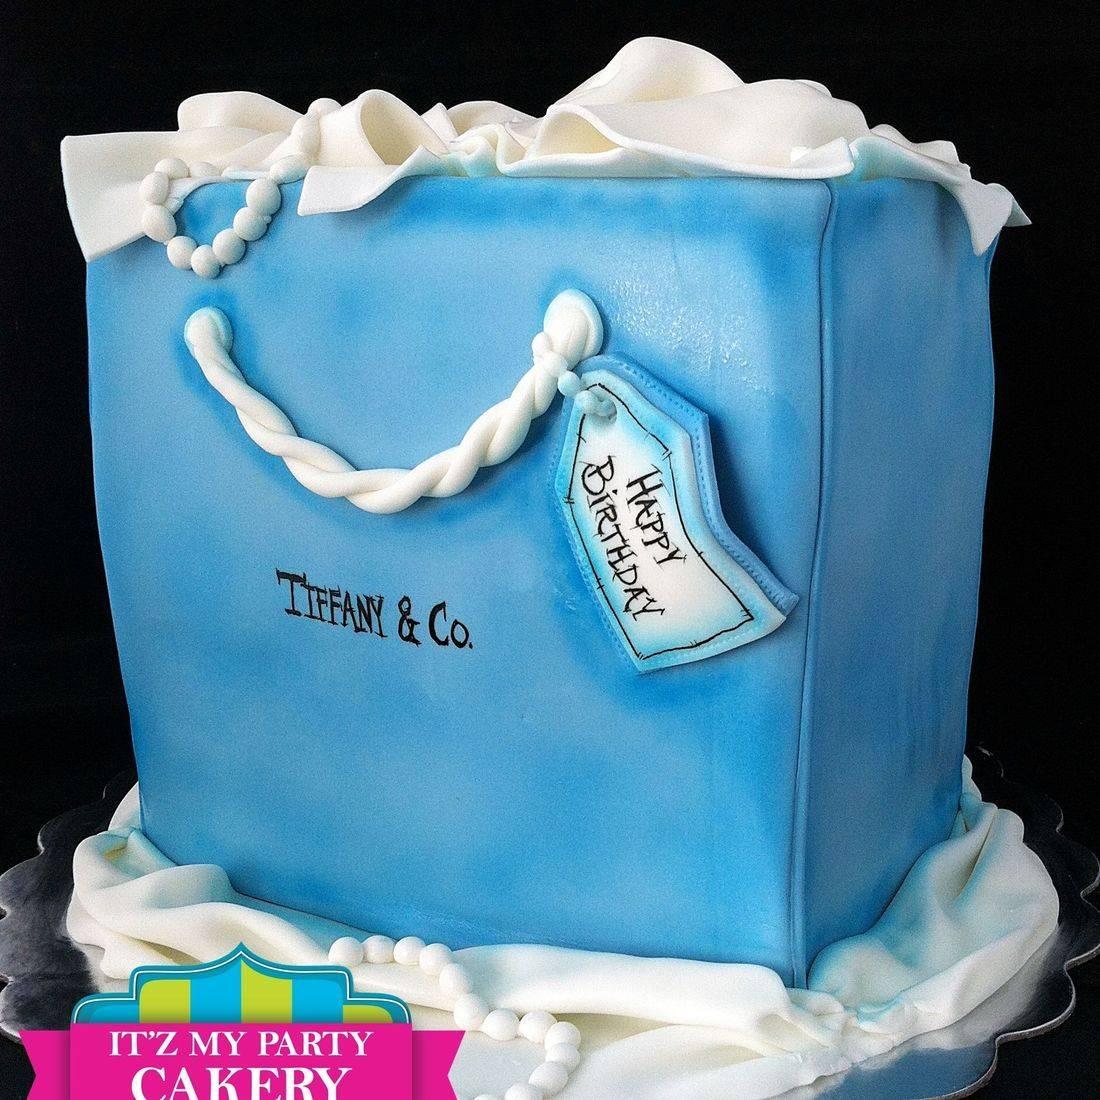 Tiffany Bag Cake Dimensional Cake Milwaukee